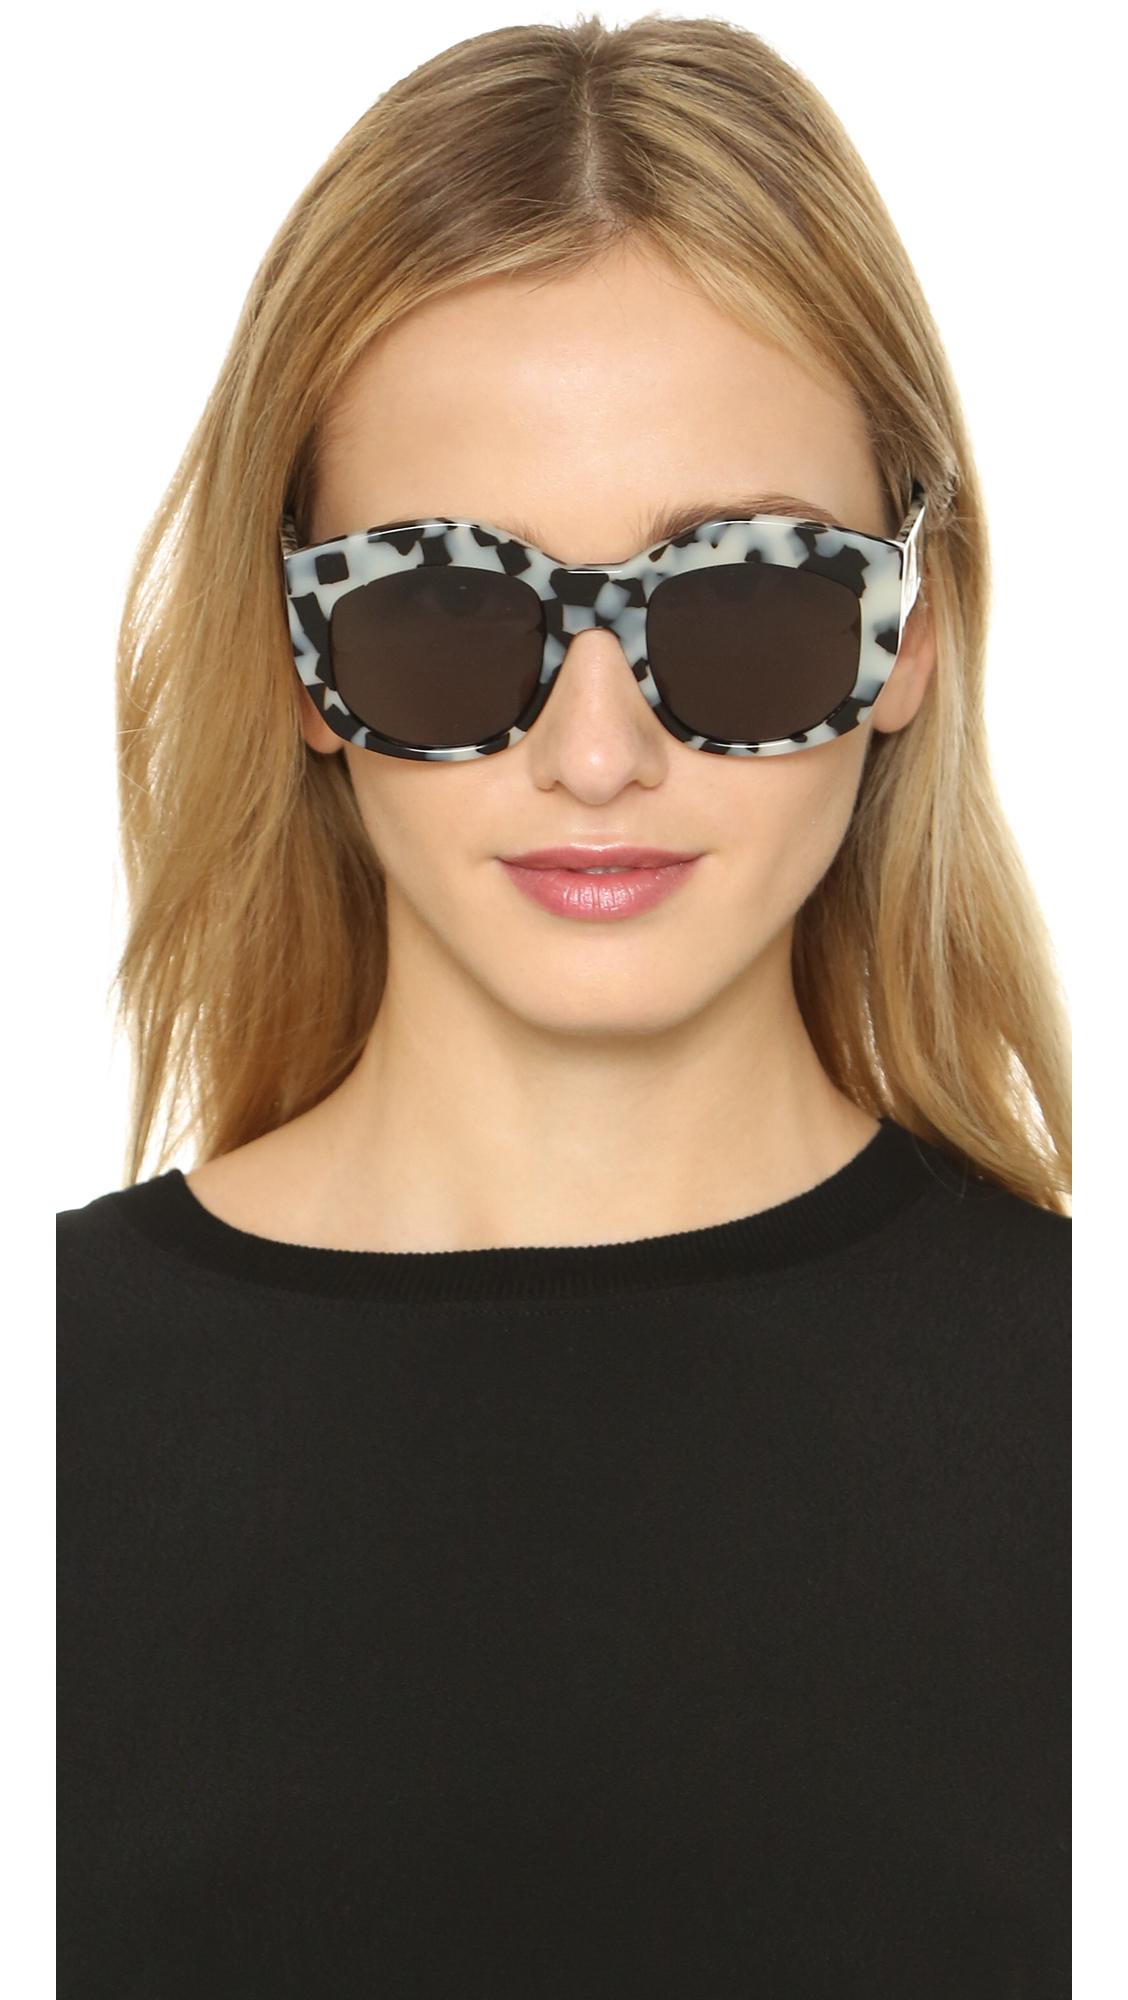 Valley Eyewear Badland Sunglasses - Snow Leopard Tort/black